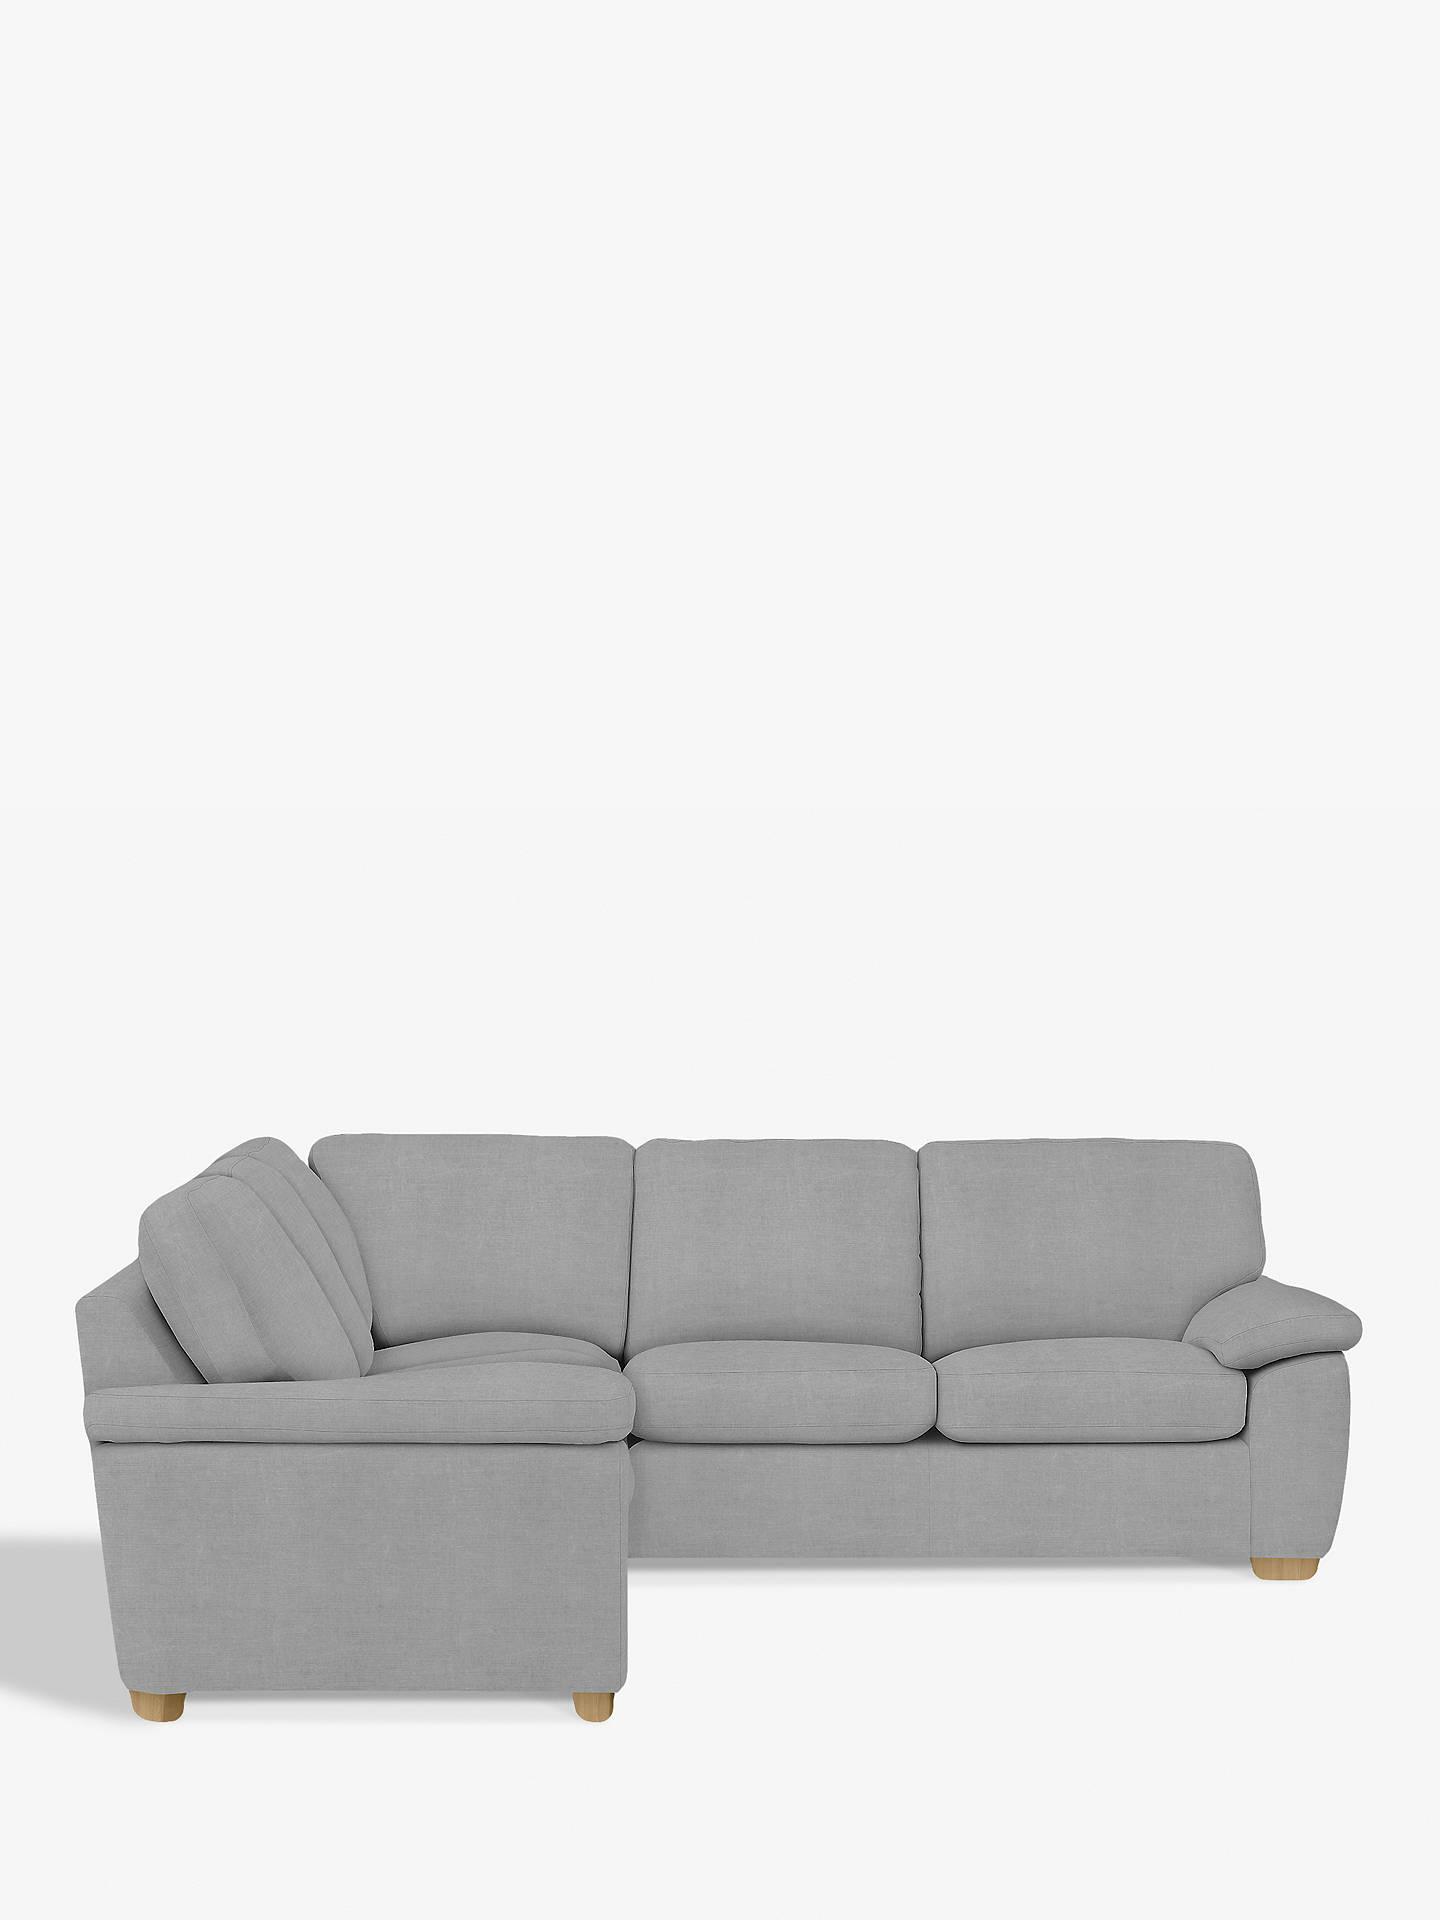 John Lewis & Partners Camden Corner Sofa